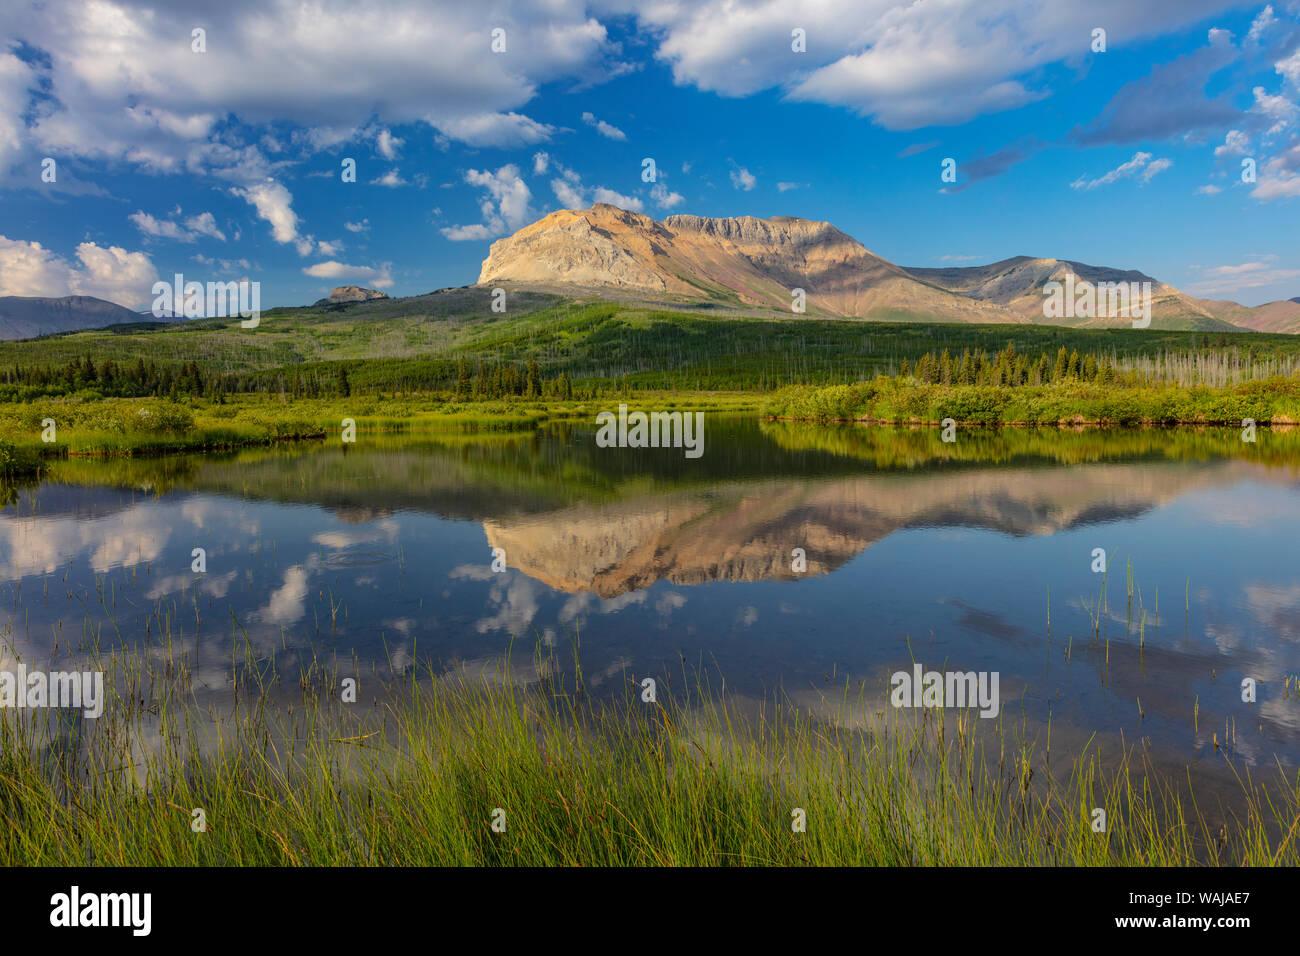 Sofa Mountain reflecting into beaver pond in Waterton Lakes National Park, Alberta, Canada Stock Photo